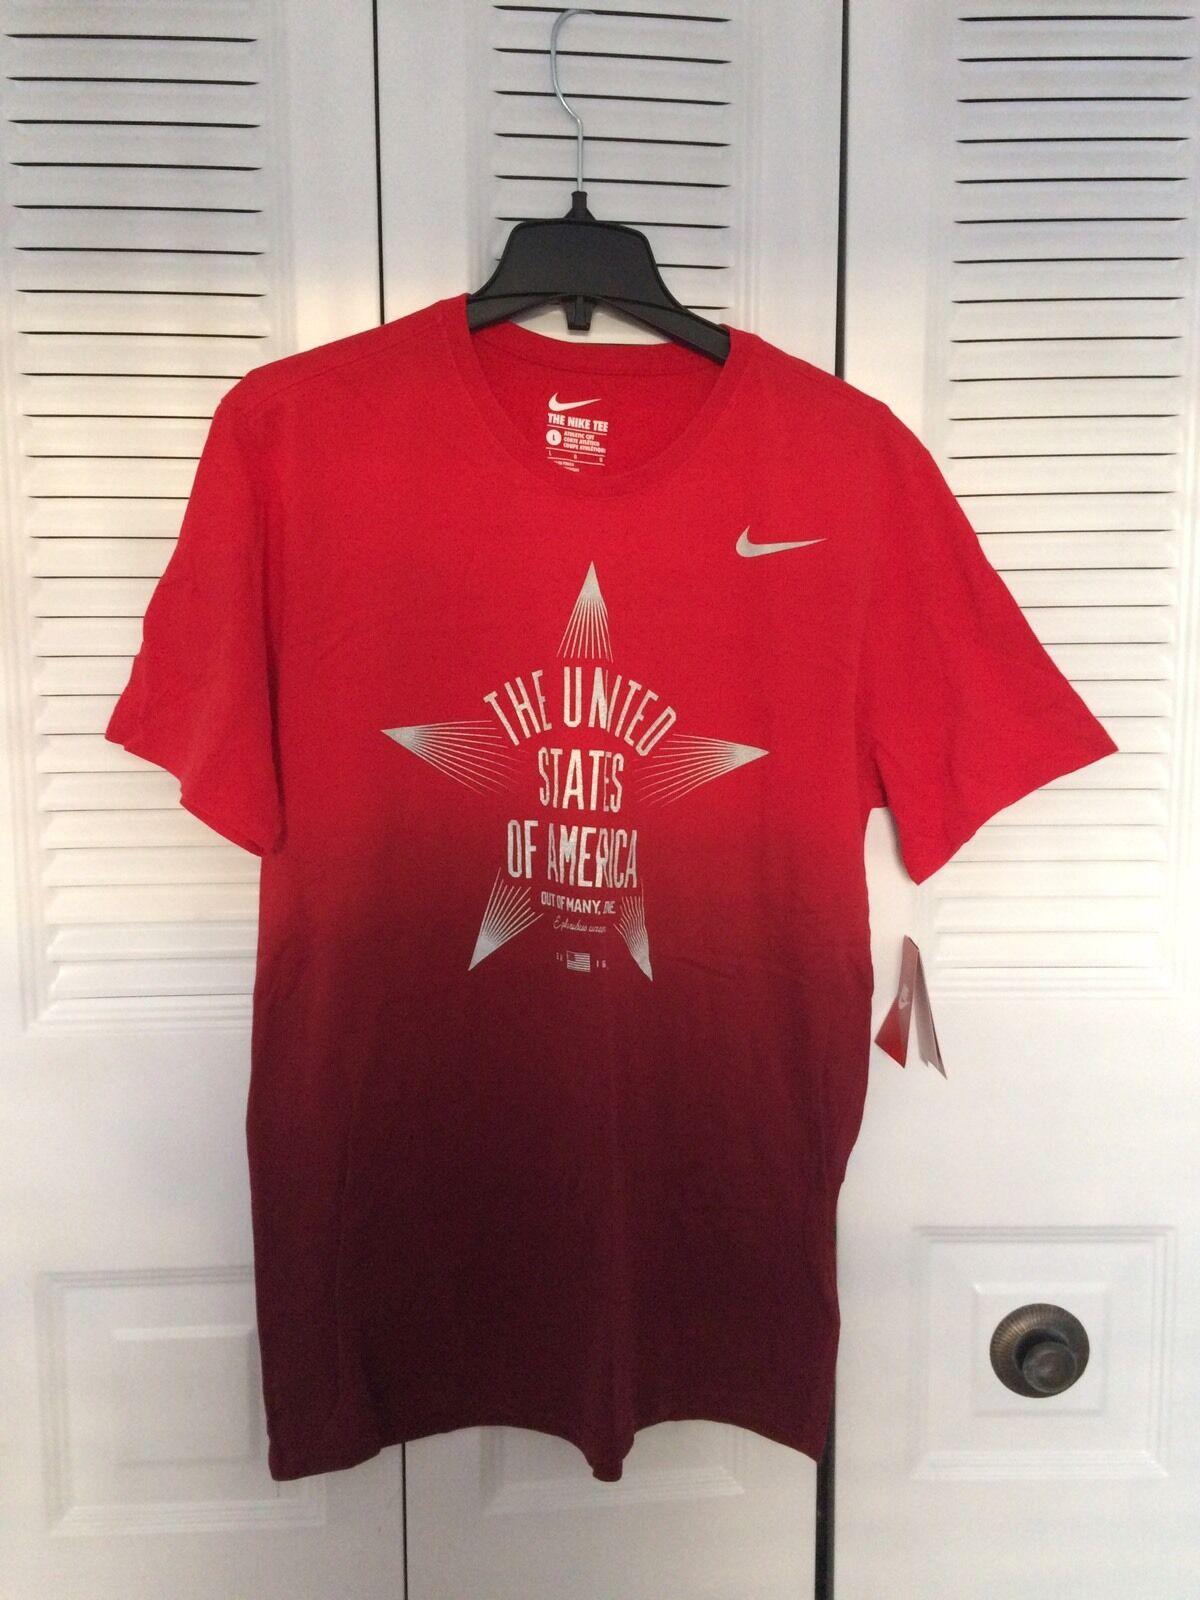 Men's NIKE USA RIO 2016 OLYMPIC 'Reflective Star' Sz L [801158 687] T-Shirt